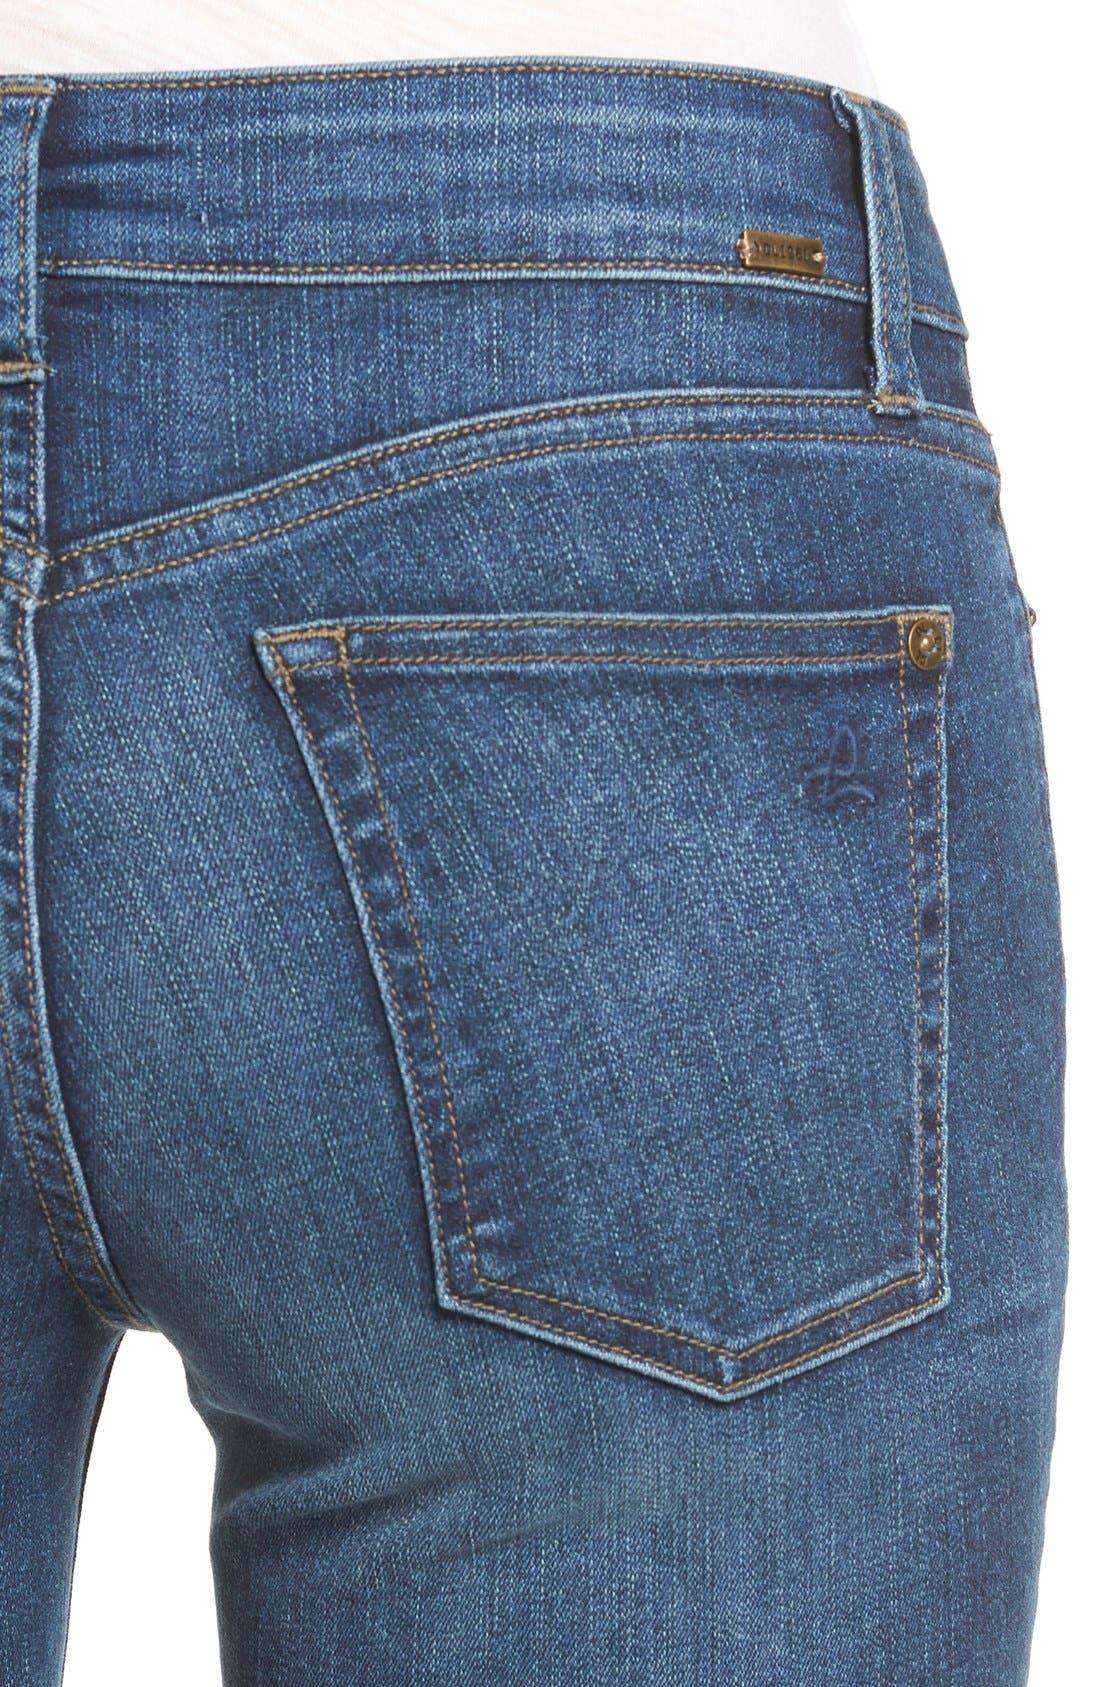 Mara Straight Leg Jeans,                             Alternate thumbnail 5, color,                             405